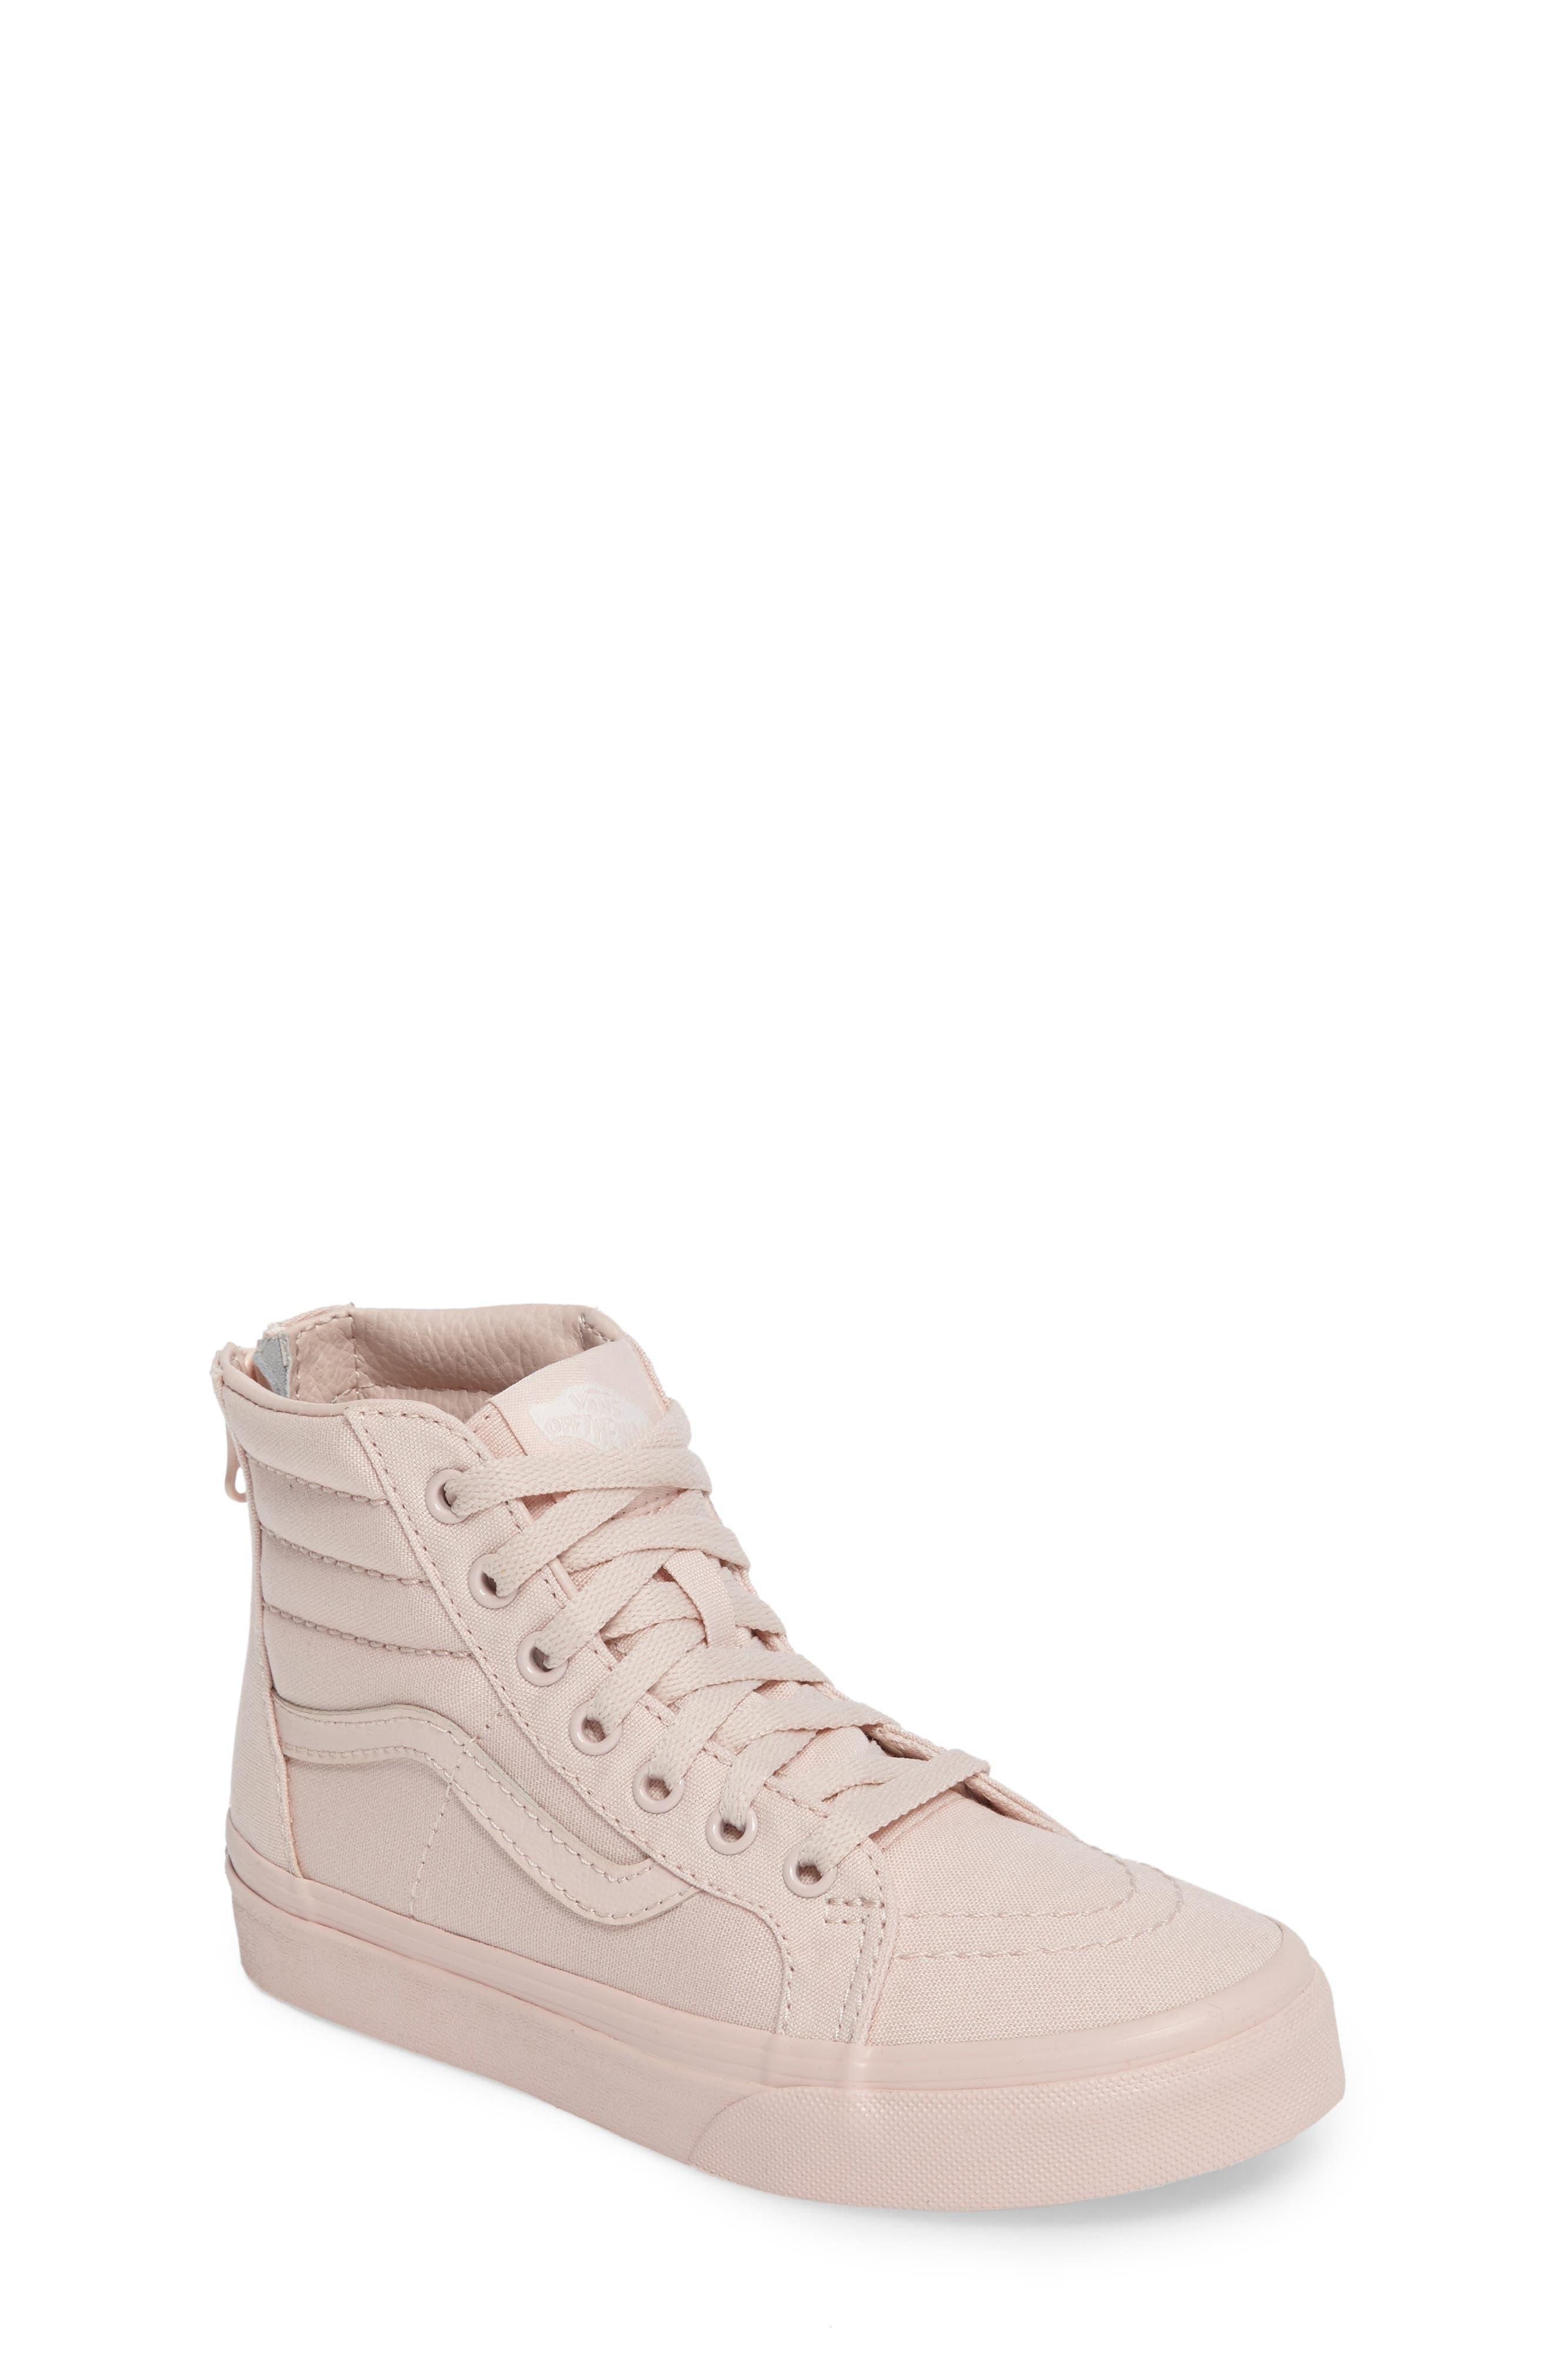 SK8-Hi Zip Sneaker,                         Main,                         color, Peach Blush Canvas